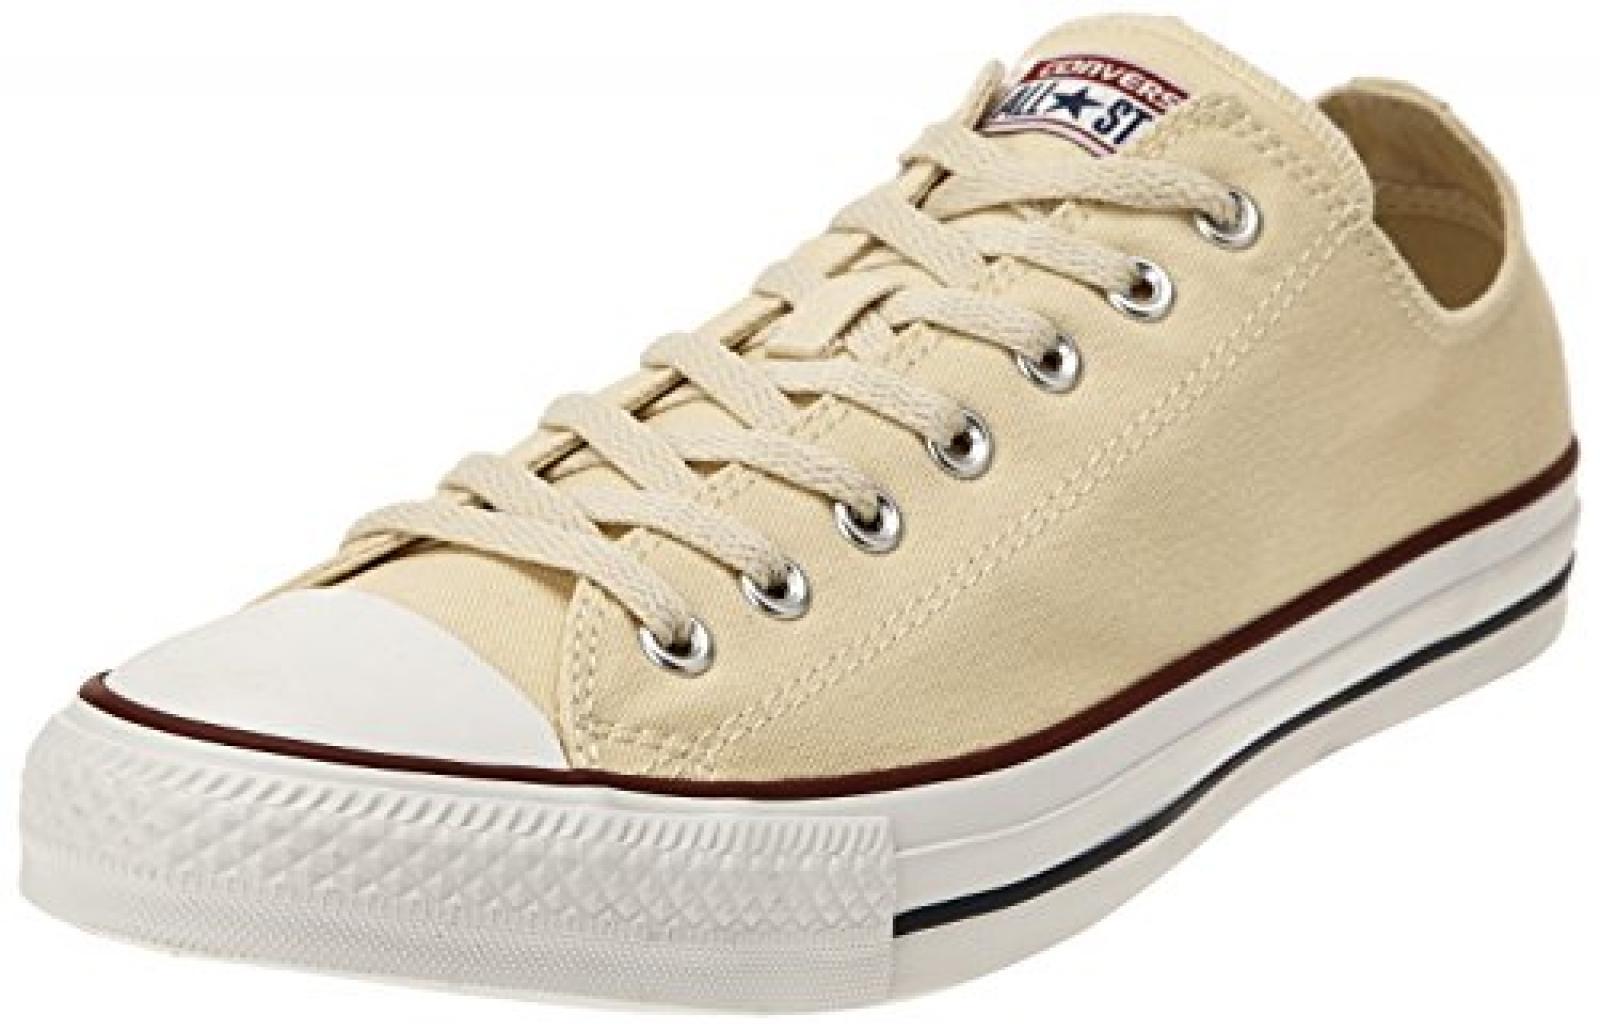 Converse CT AS SP OX M9165, Unisex - Erwachsene Sneaker